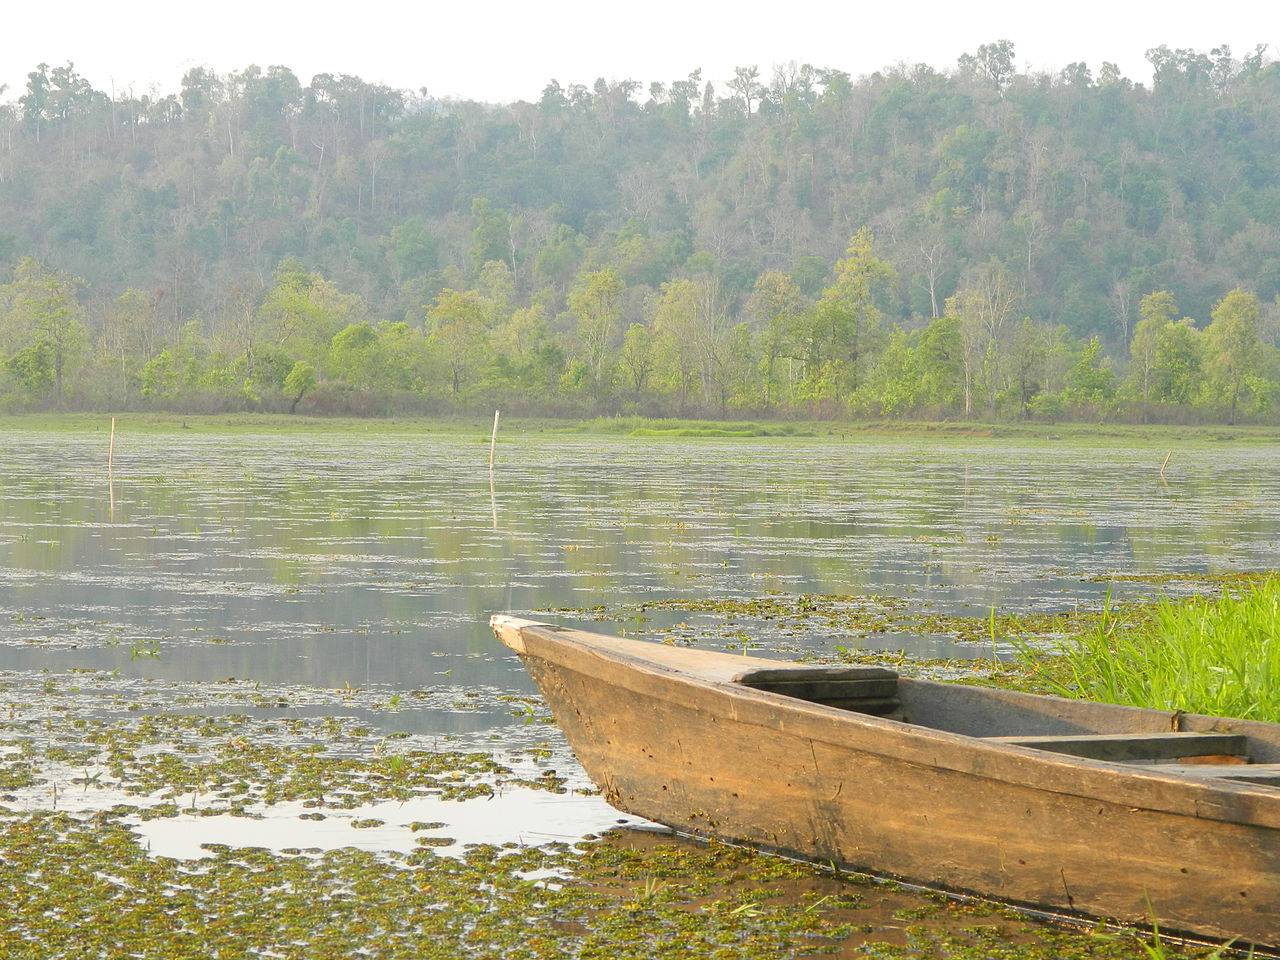 Chandubi Lake - Picnic Spot in Assam